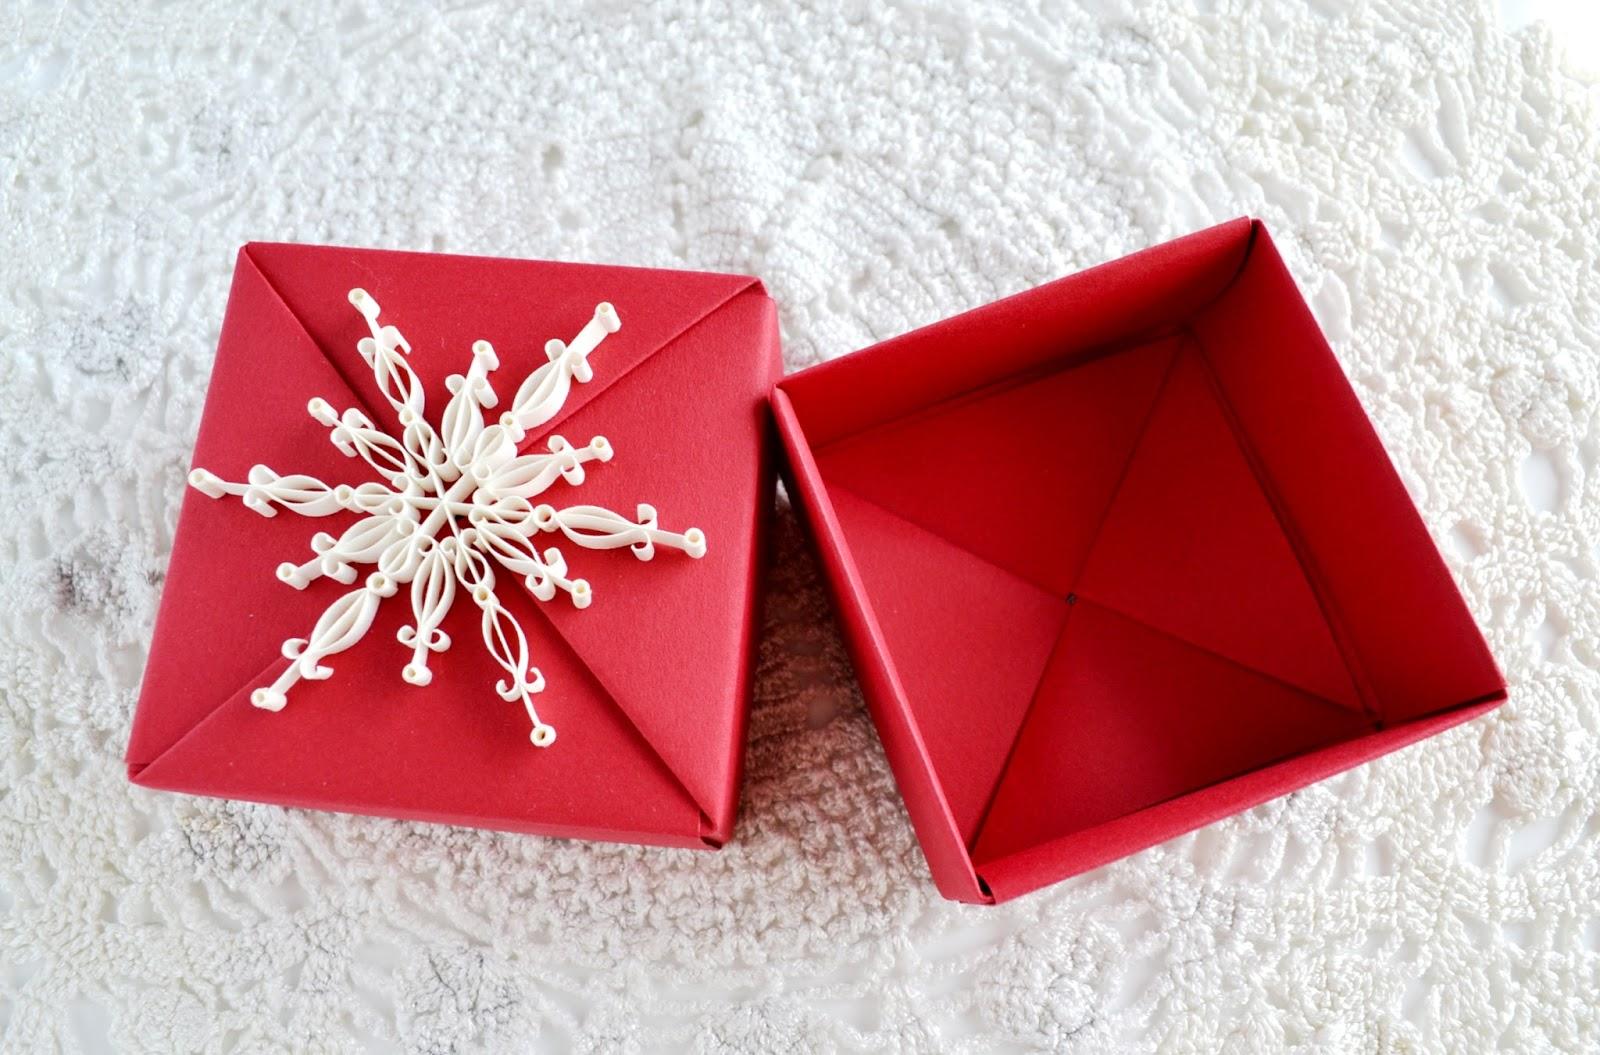 Katla Kk Eyler New Cute Gift Boxes Up On Etsy